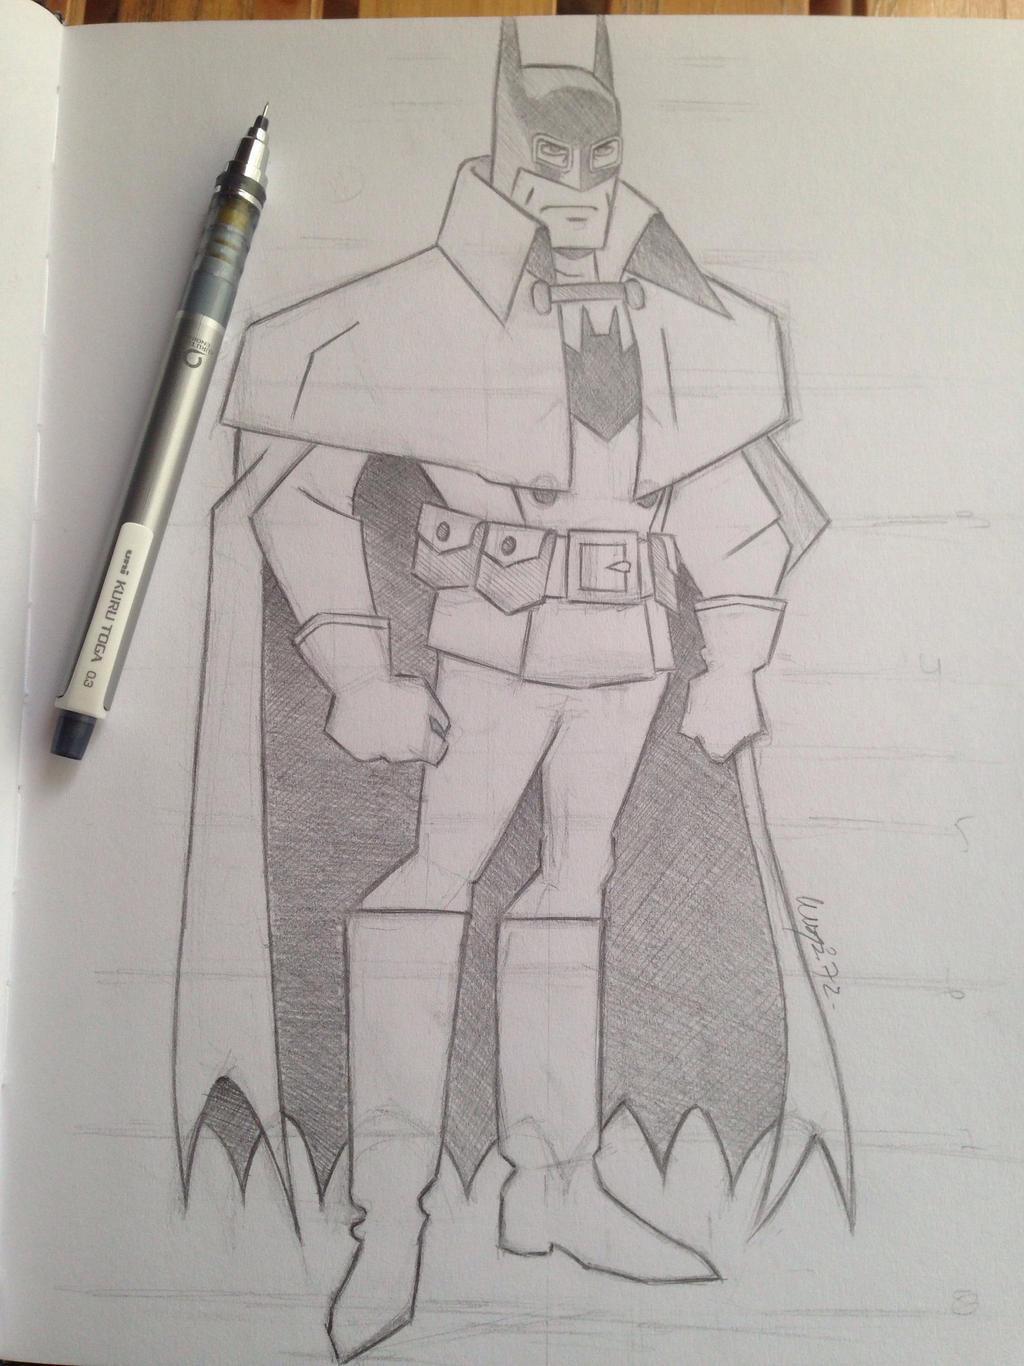 Batman Gotham By Gaslight Sketch By Luispi72 On Deviantart